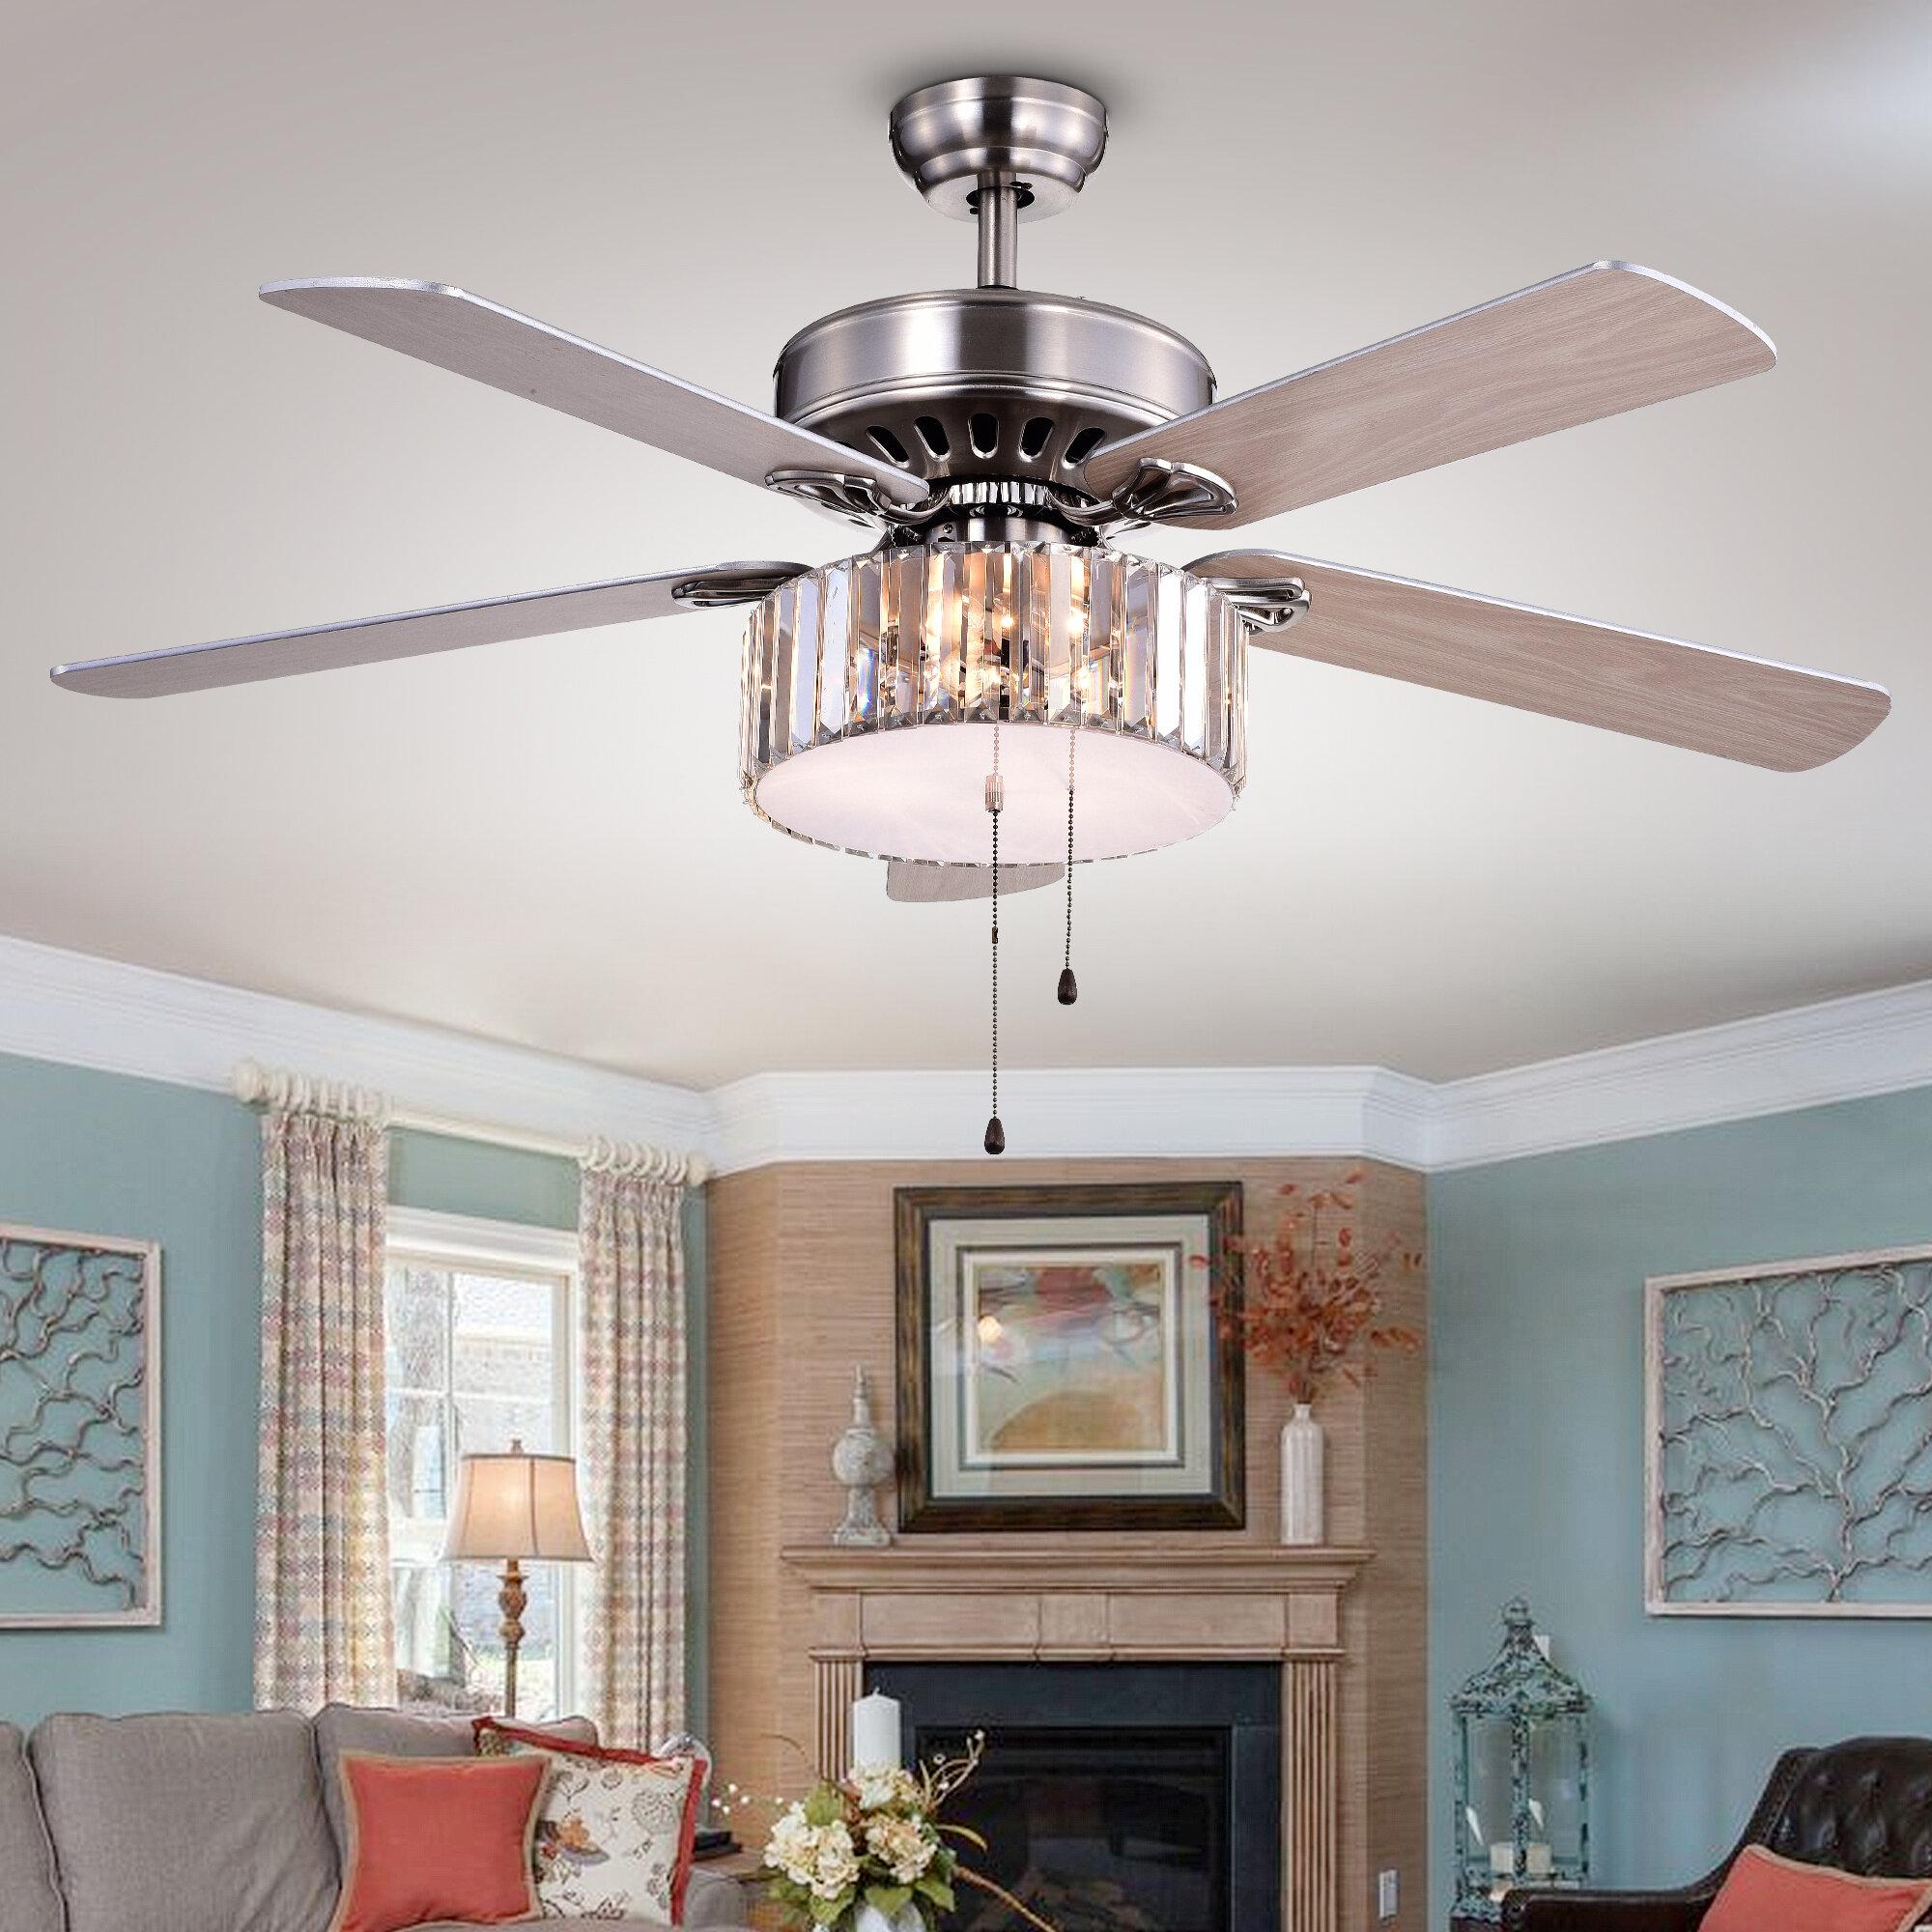 Warehouse of Tiffany Kimalex Wood 4 Blade Ceiling Fan & Reviews